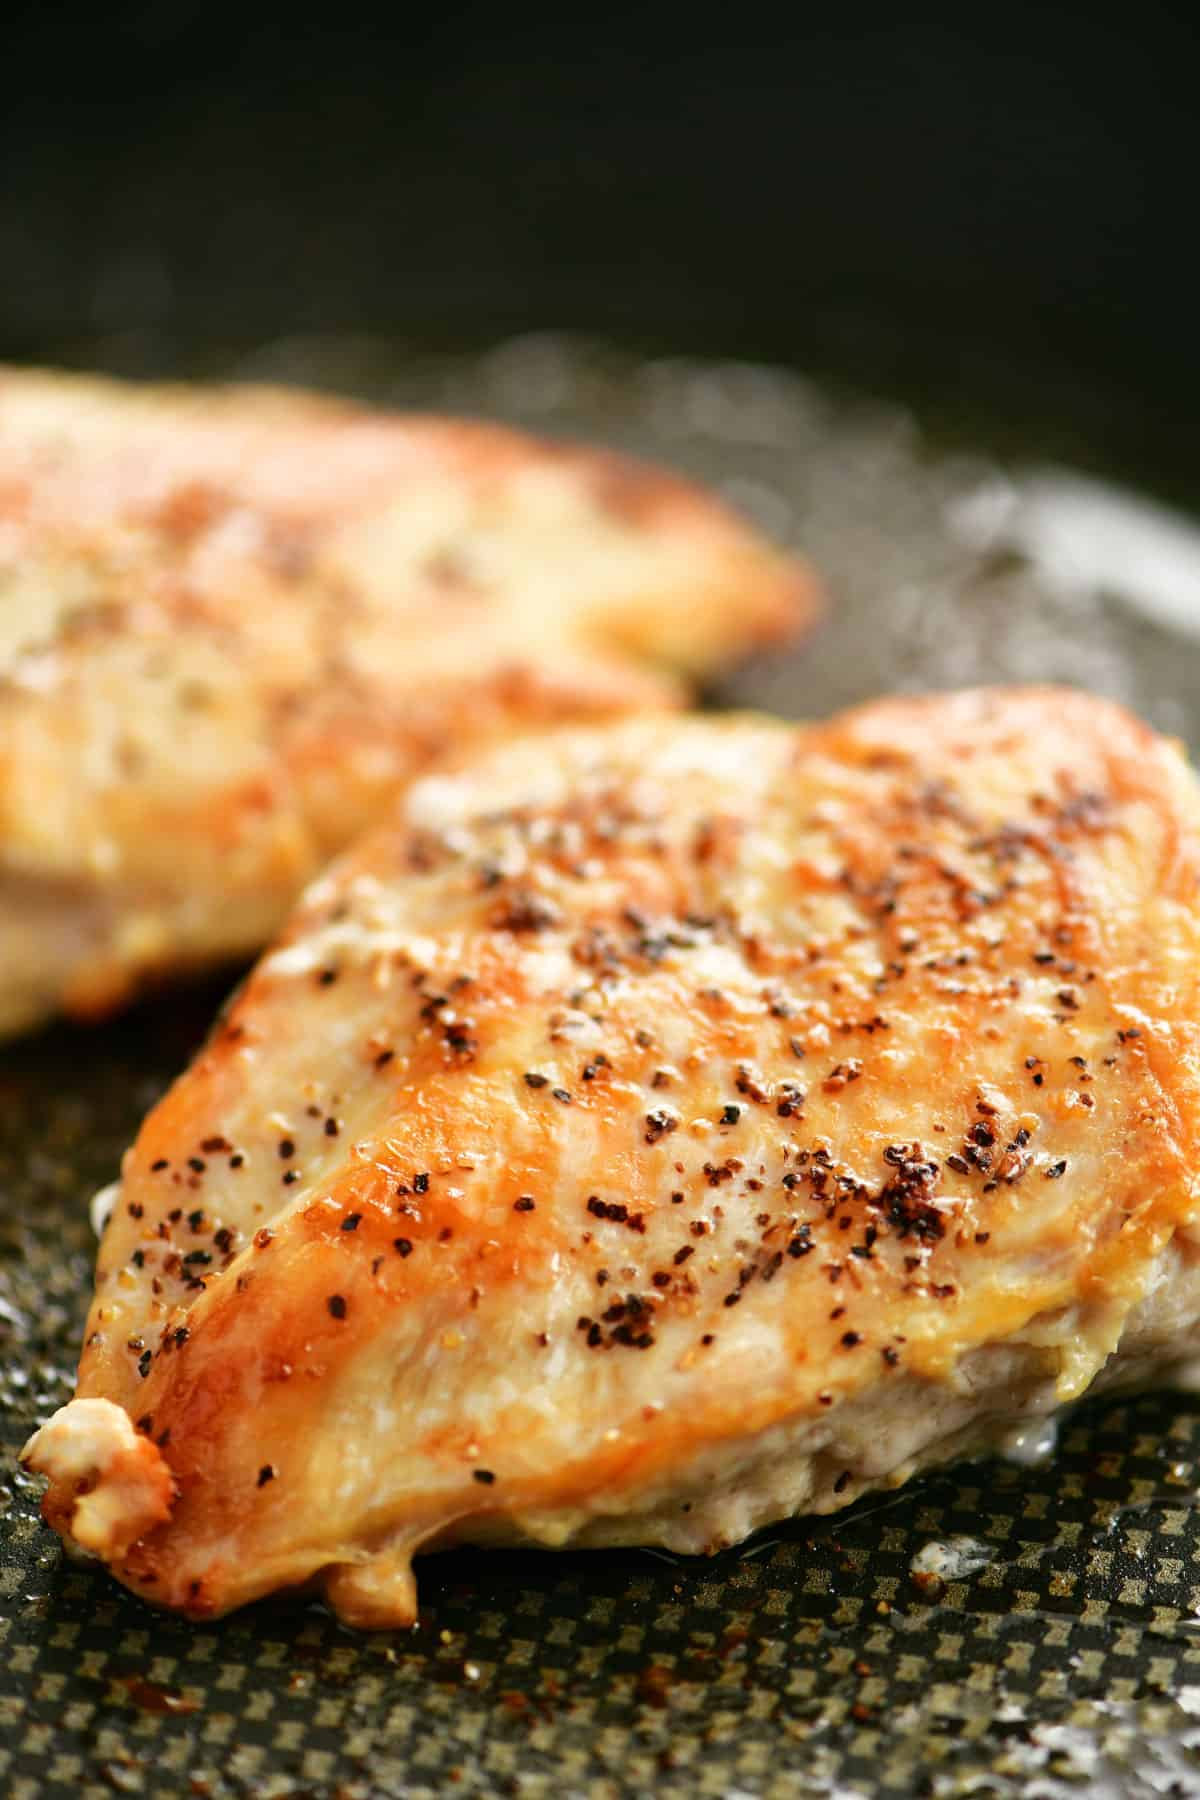 kirkland chicken breast cooking instructions